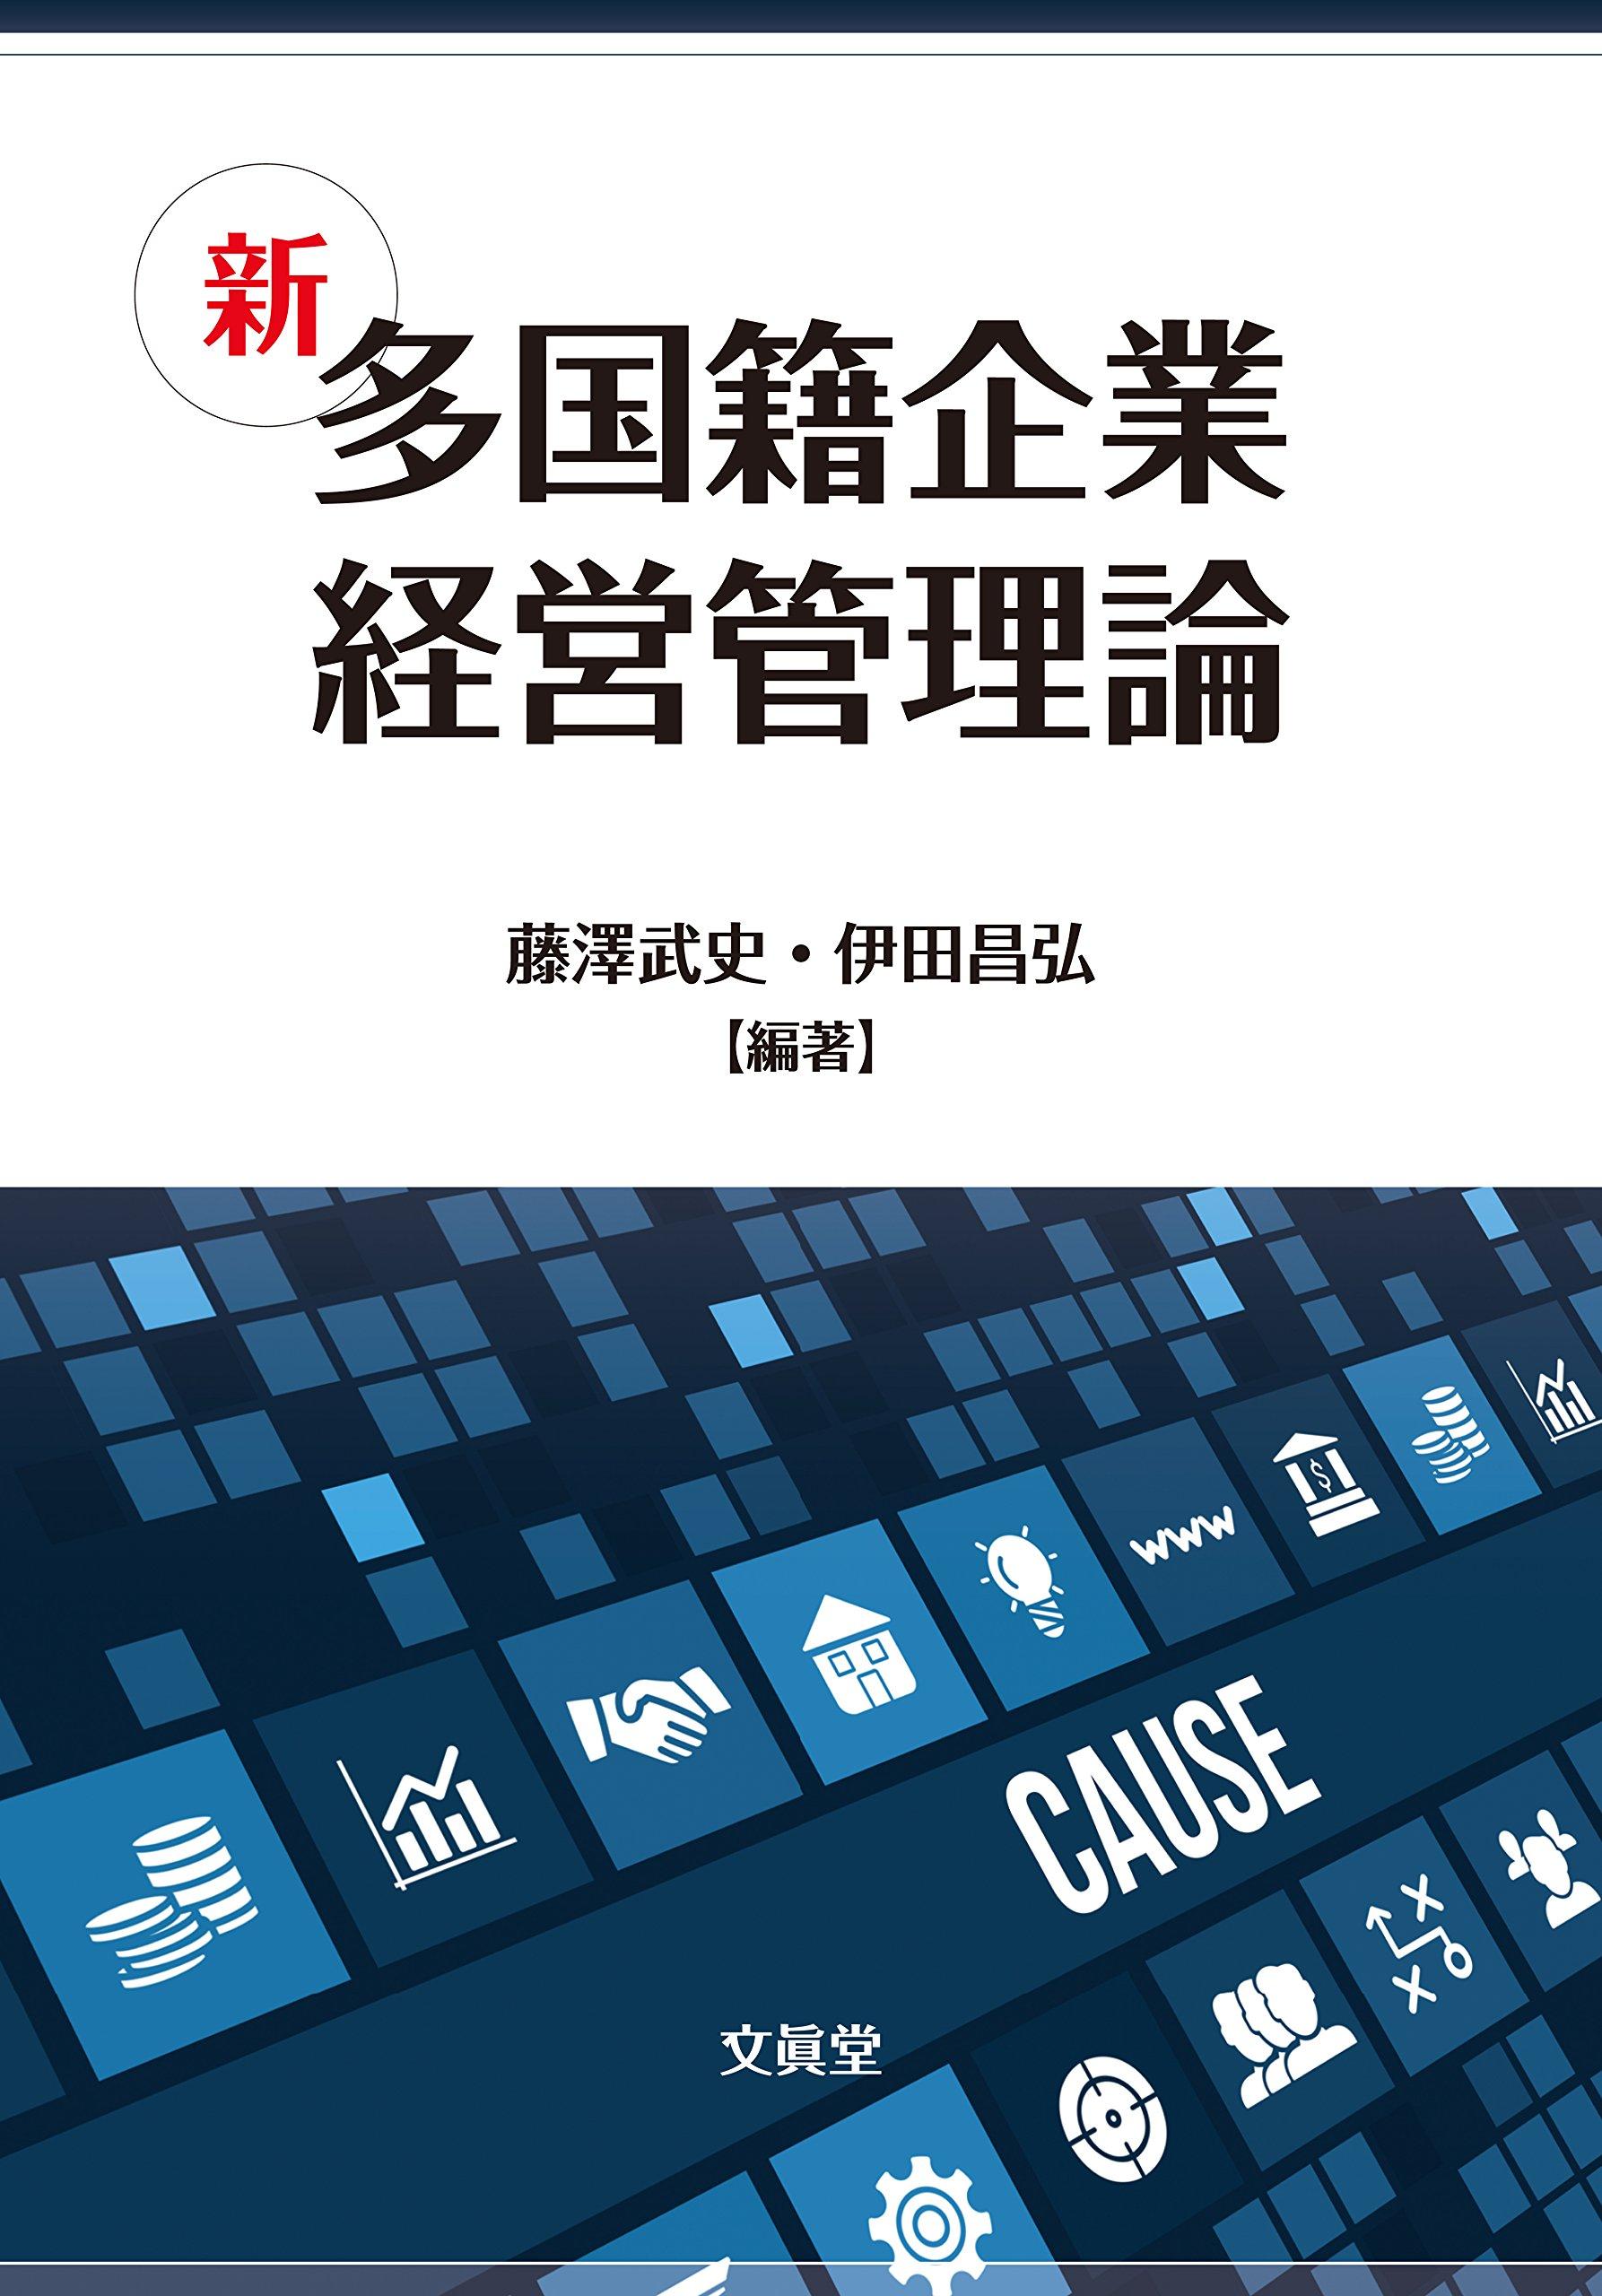 OECD開発センター編著、門田 清(東京国際大学)著 『新 多国籍企業経営管理論』